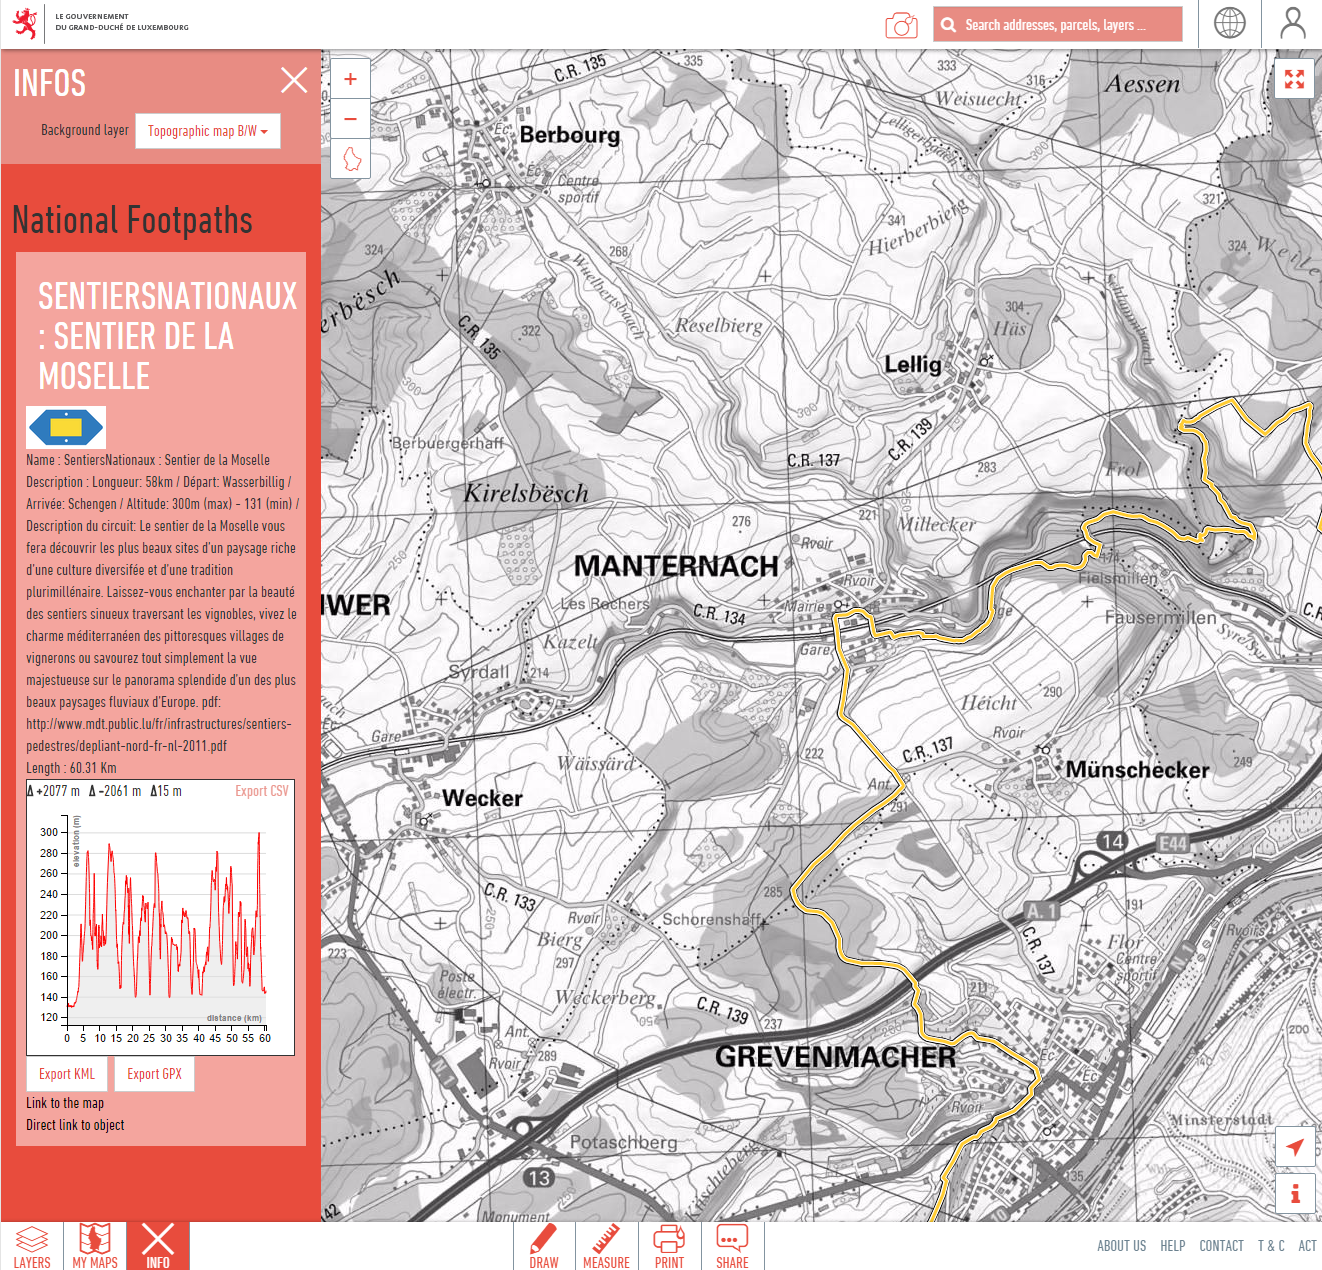 Geoportal - Find hiking trails